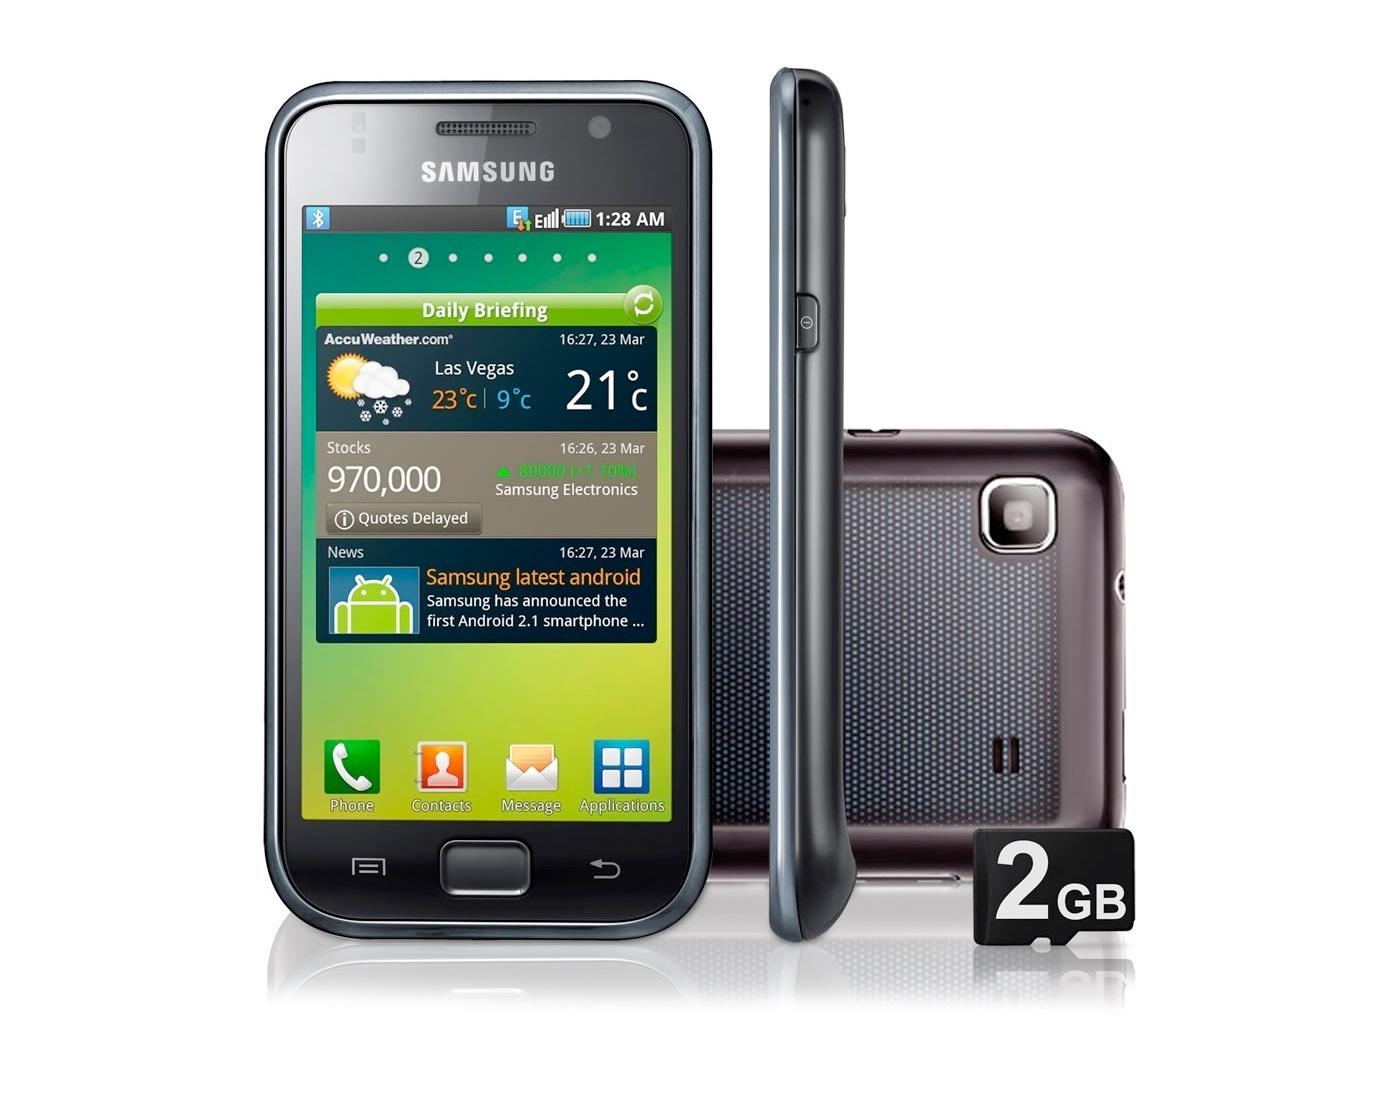 Galaxy S, o top de linha